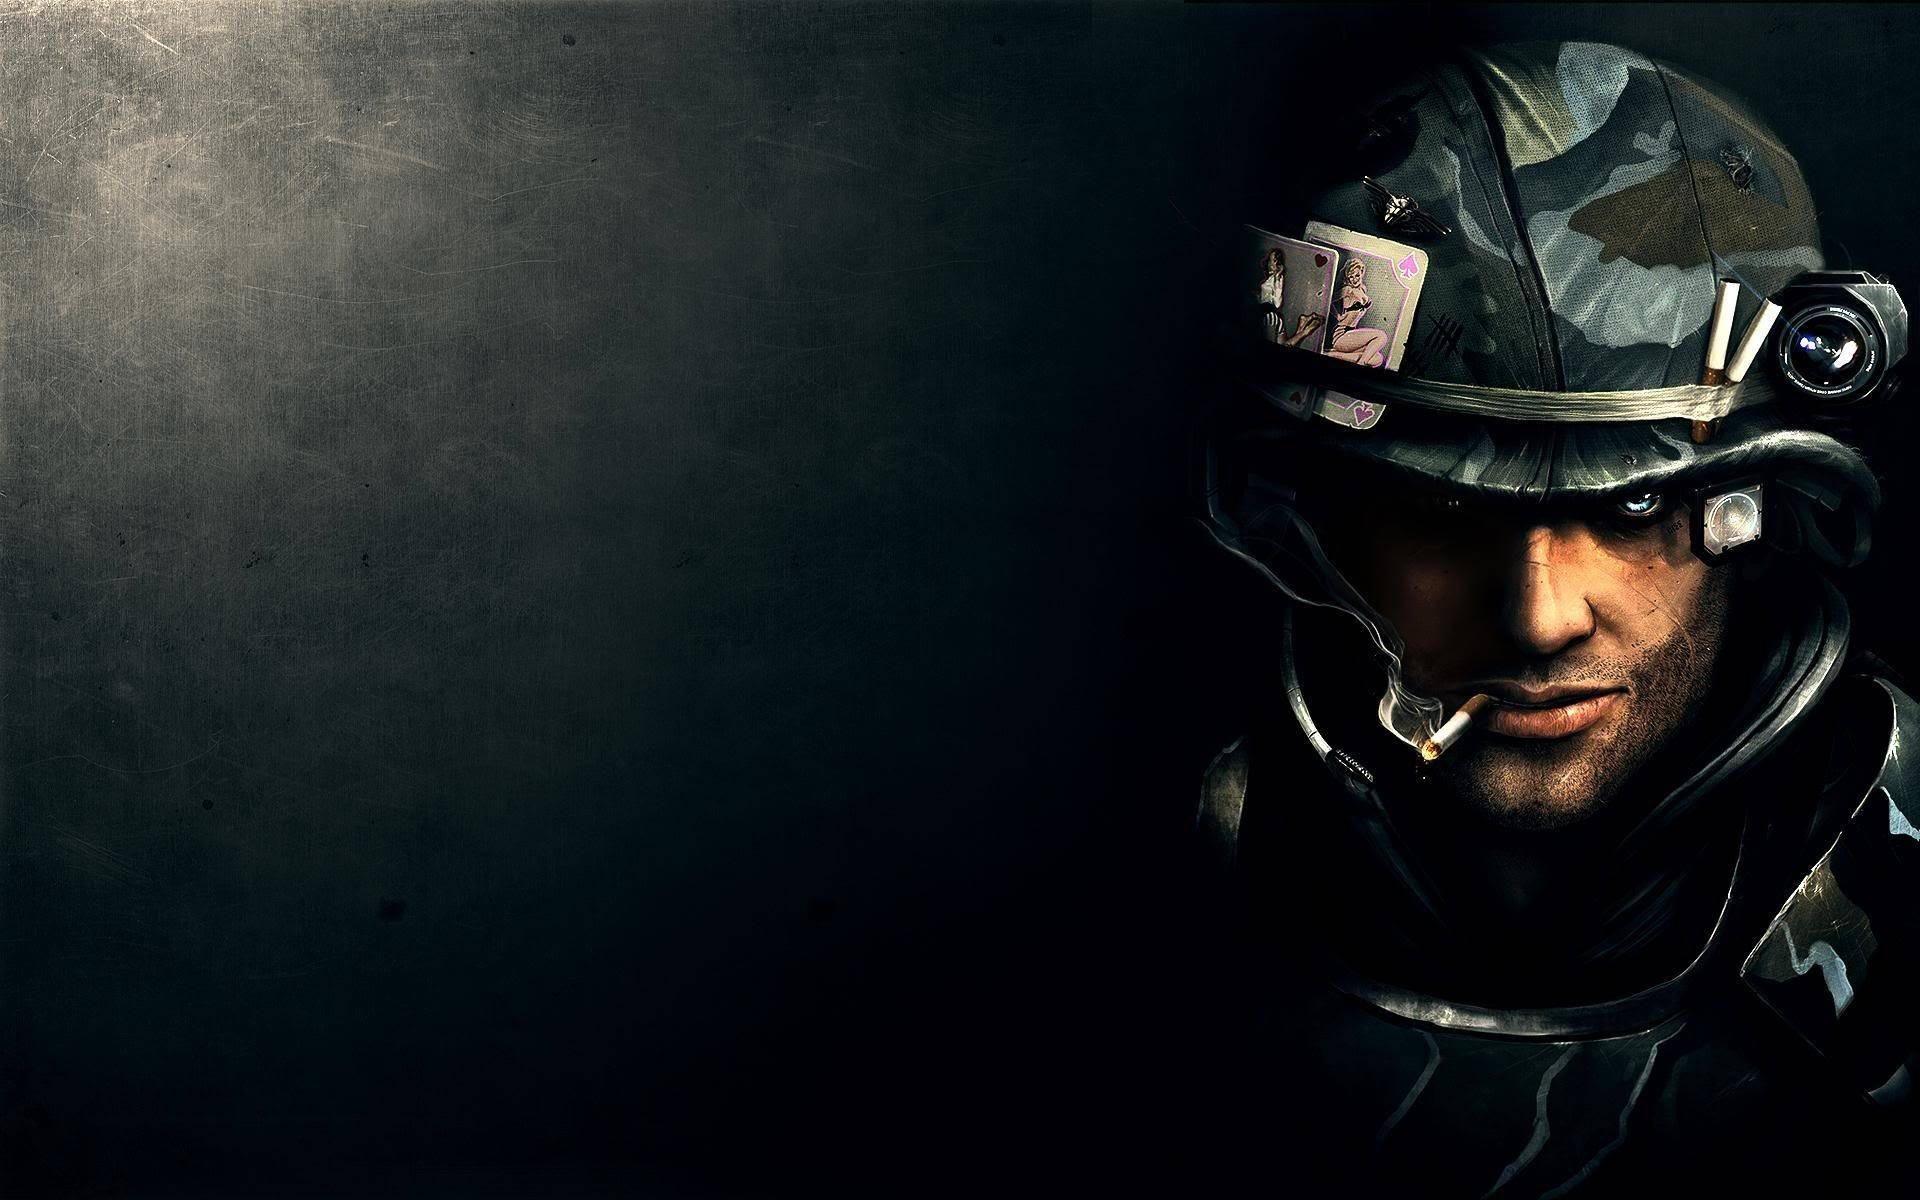 Us Army Desktop Wallpapers – Wallpaper Cave